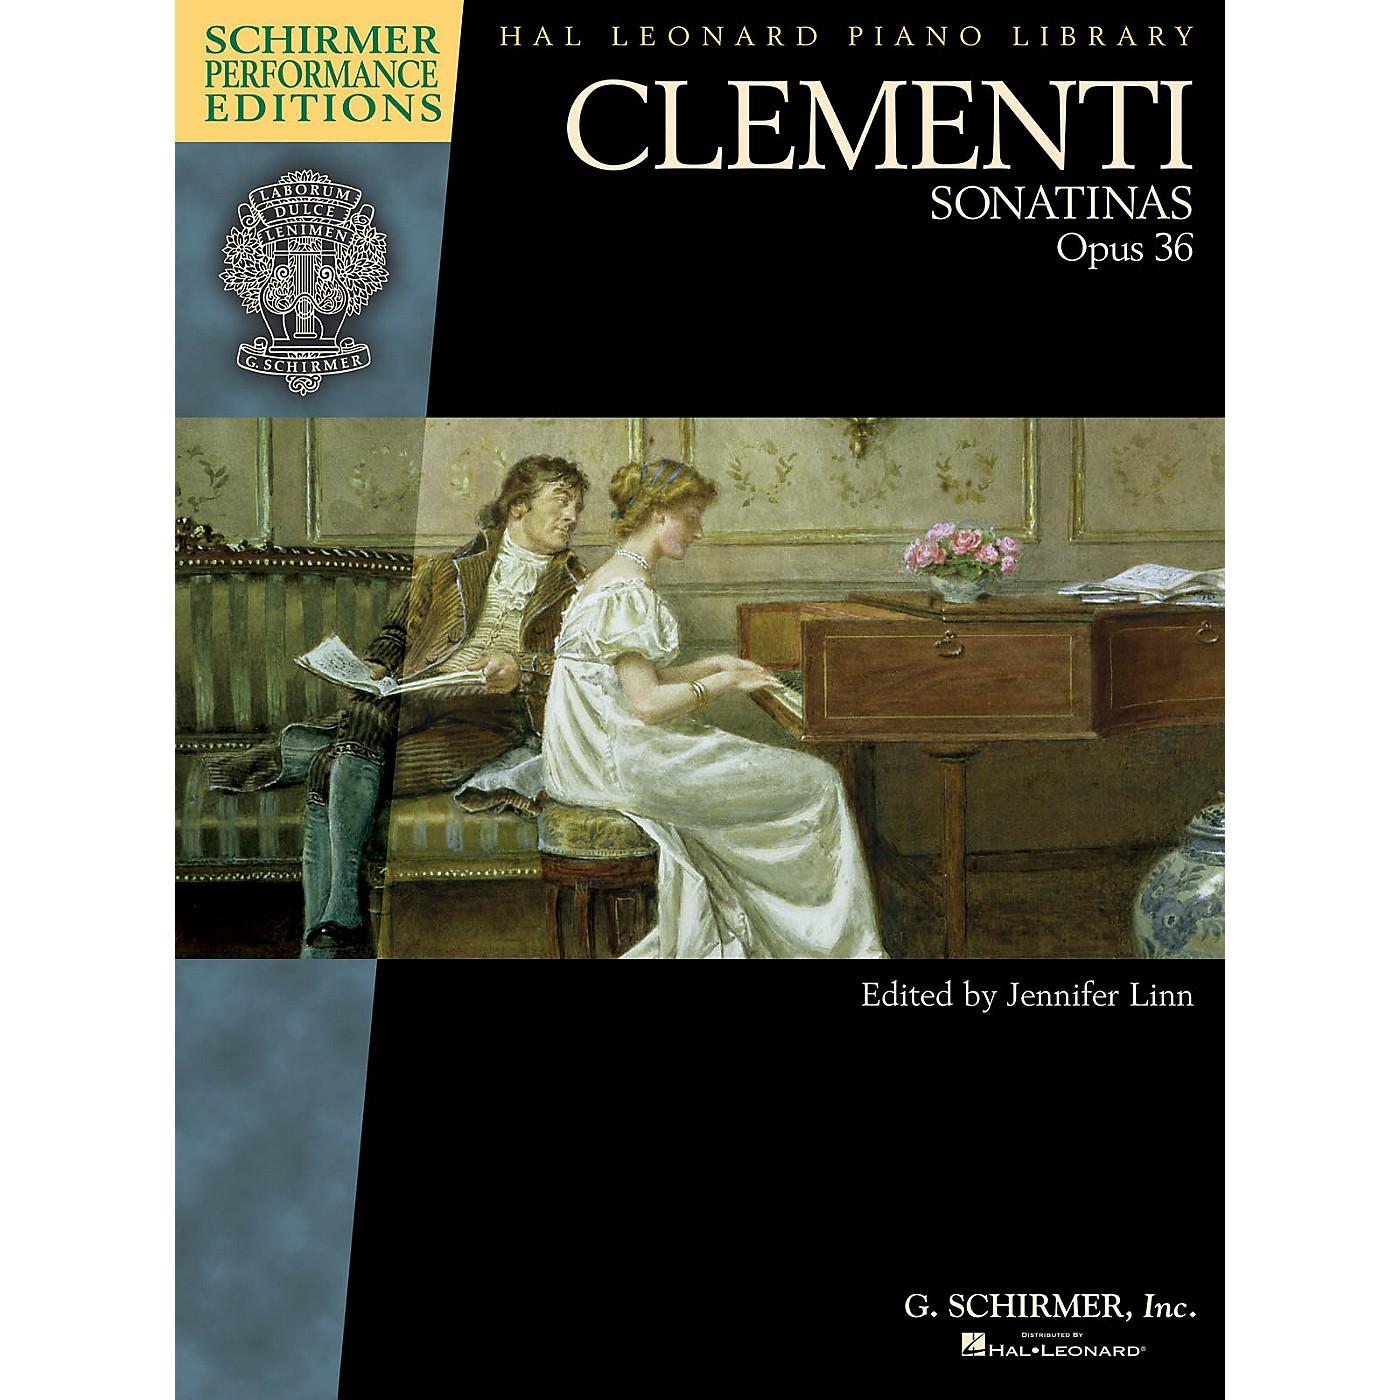 G. Schirmer Clementi - Sonatinas, Opus 36 Schirmer Performance Editions by Clementi Edited by Jennifer Linn thumbnail